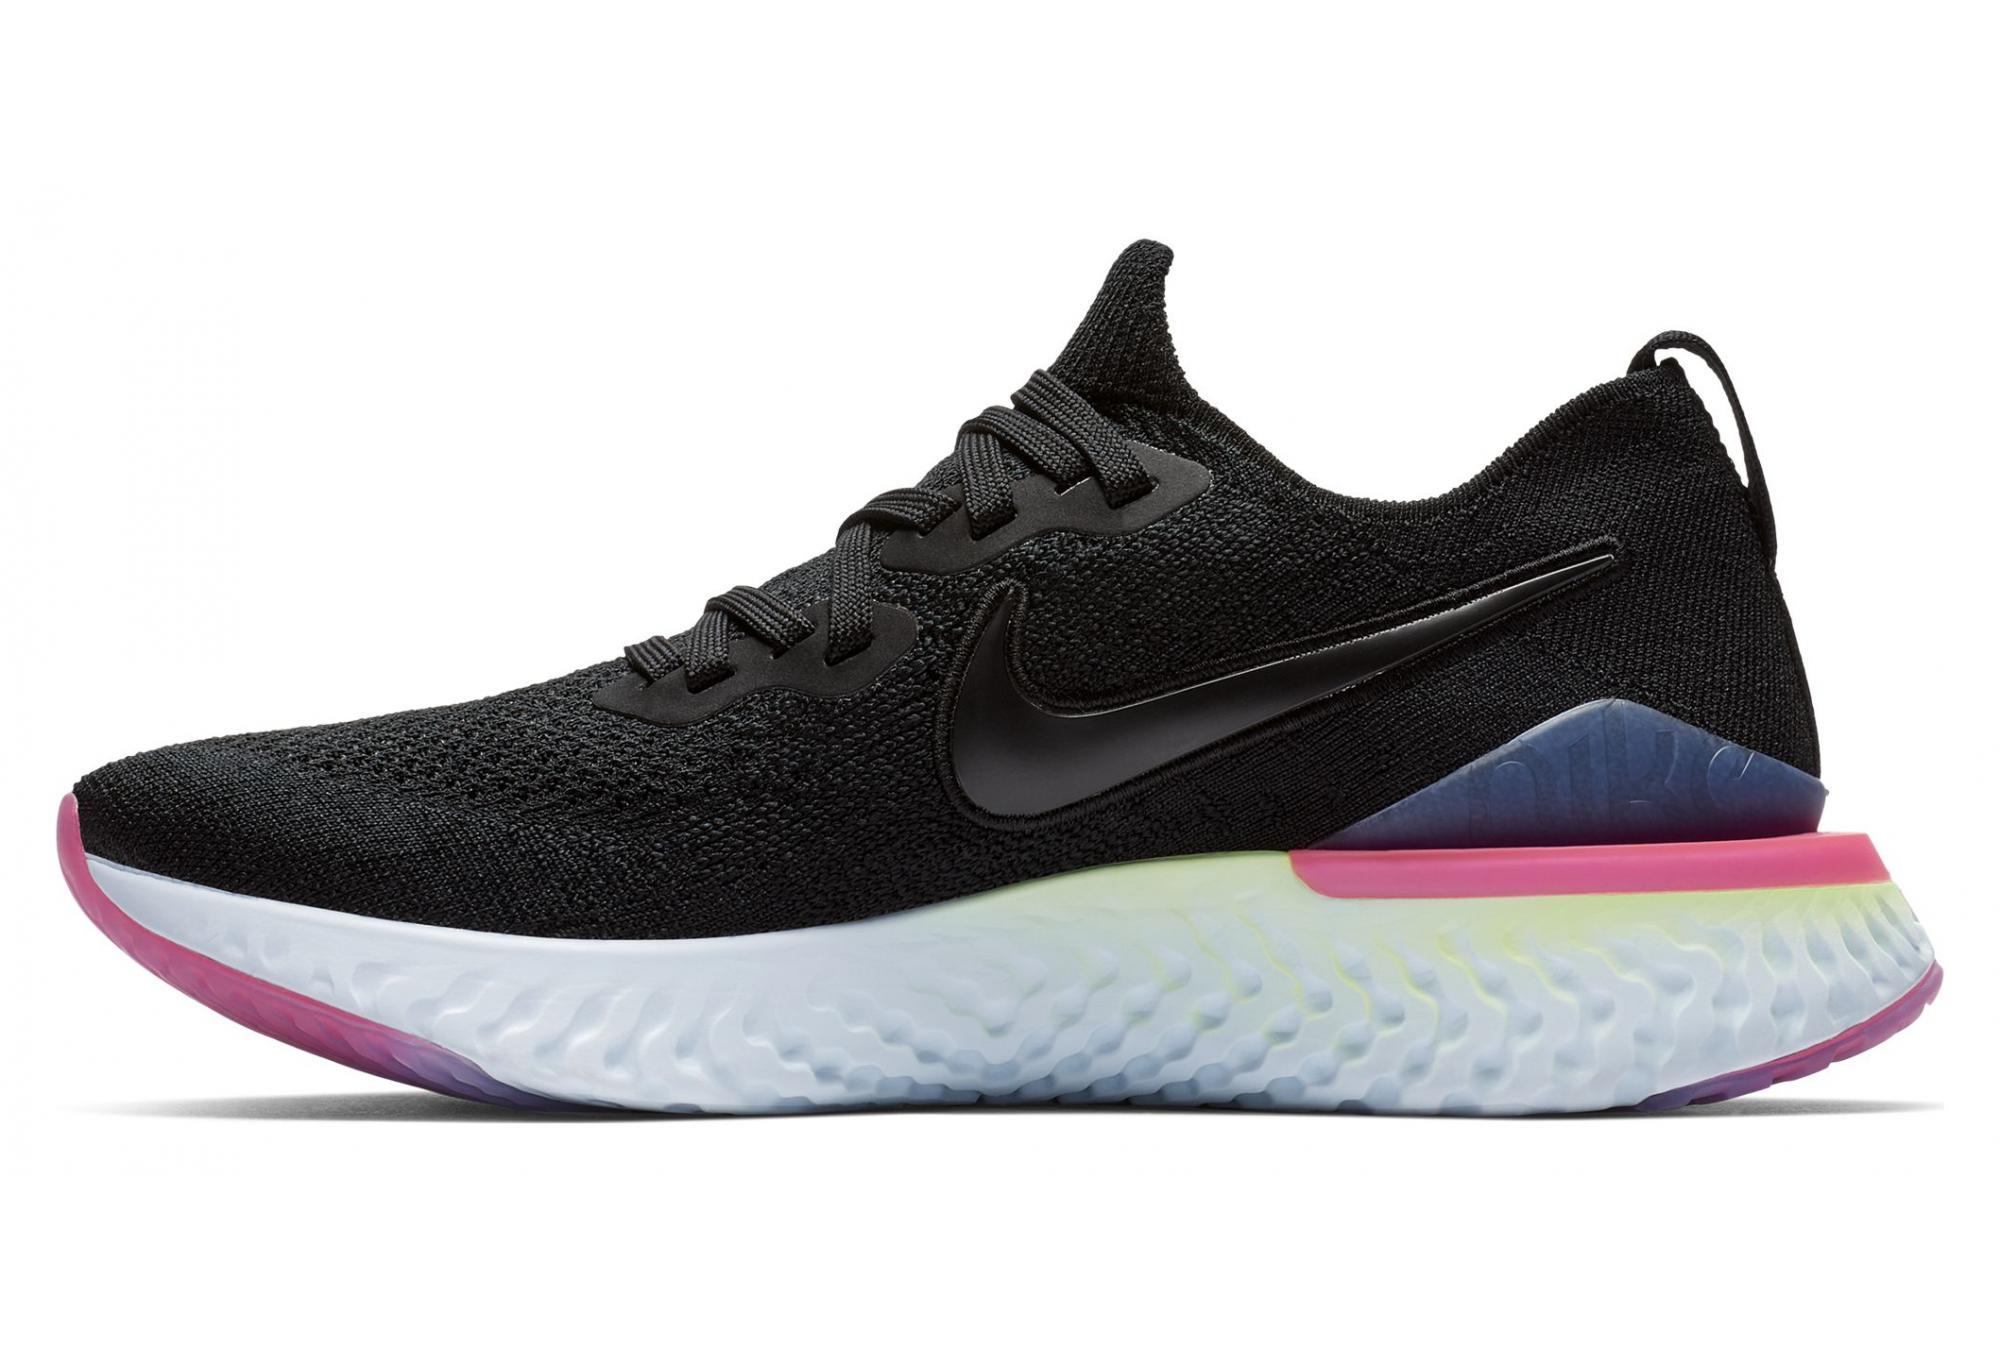 low priced e4f2b ad01f Nike Epic React Flyknit 2 Black Pink Yellow Women